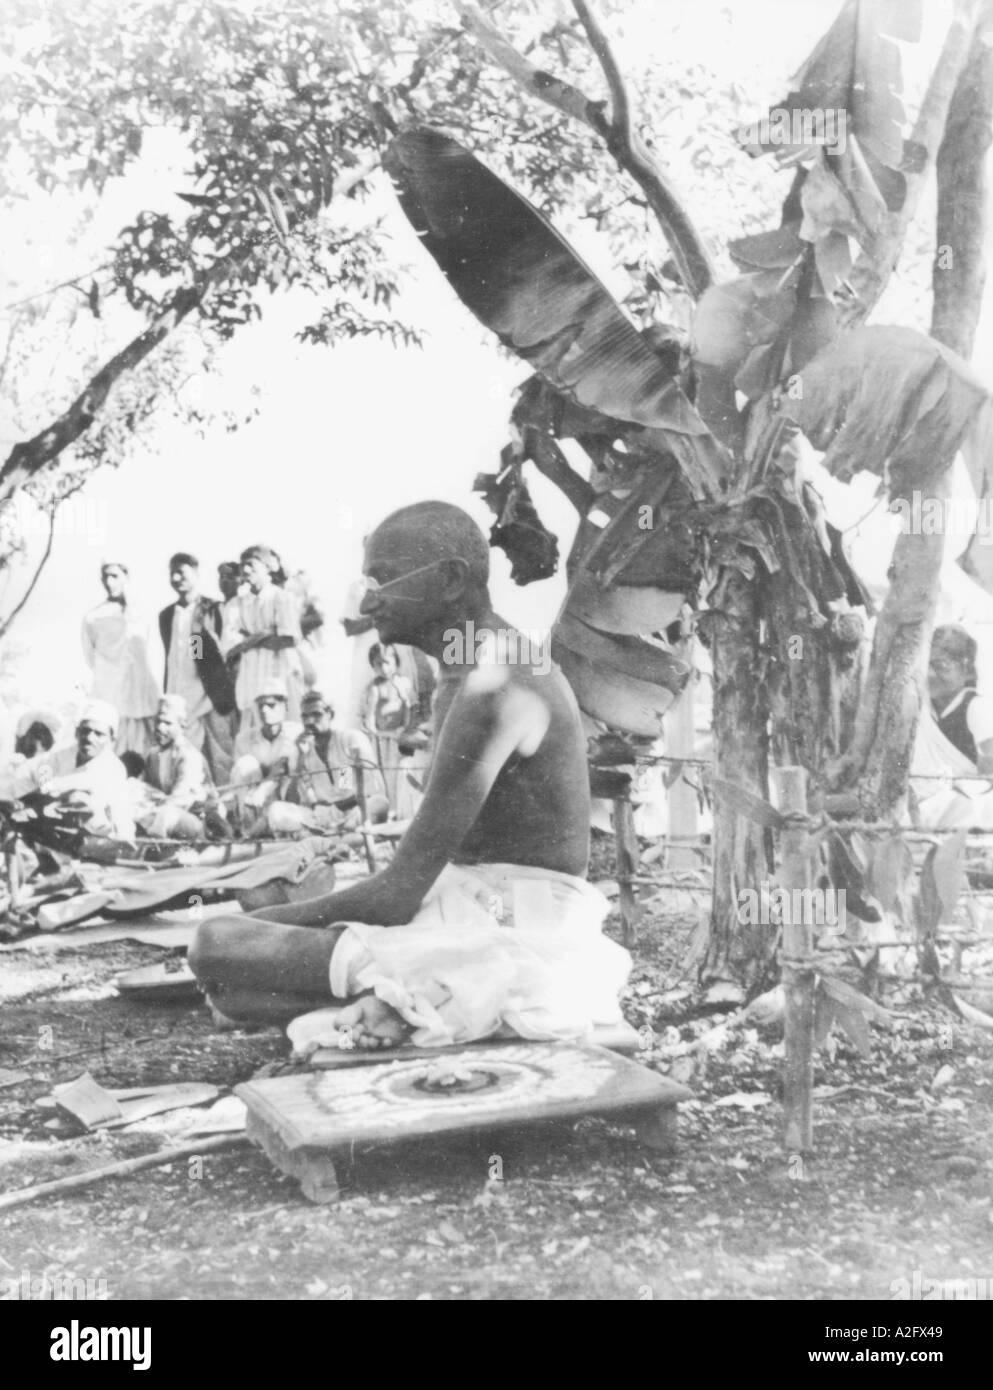 MKG33108 il Mahatma Gandhi a una funzione cerimoniale a Sevagram Ashram Wardha Maharashta India Agosto 1944 Immagini Stock